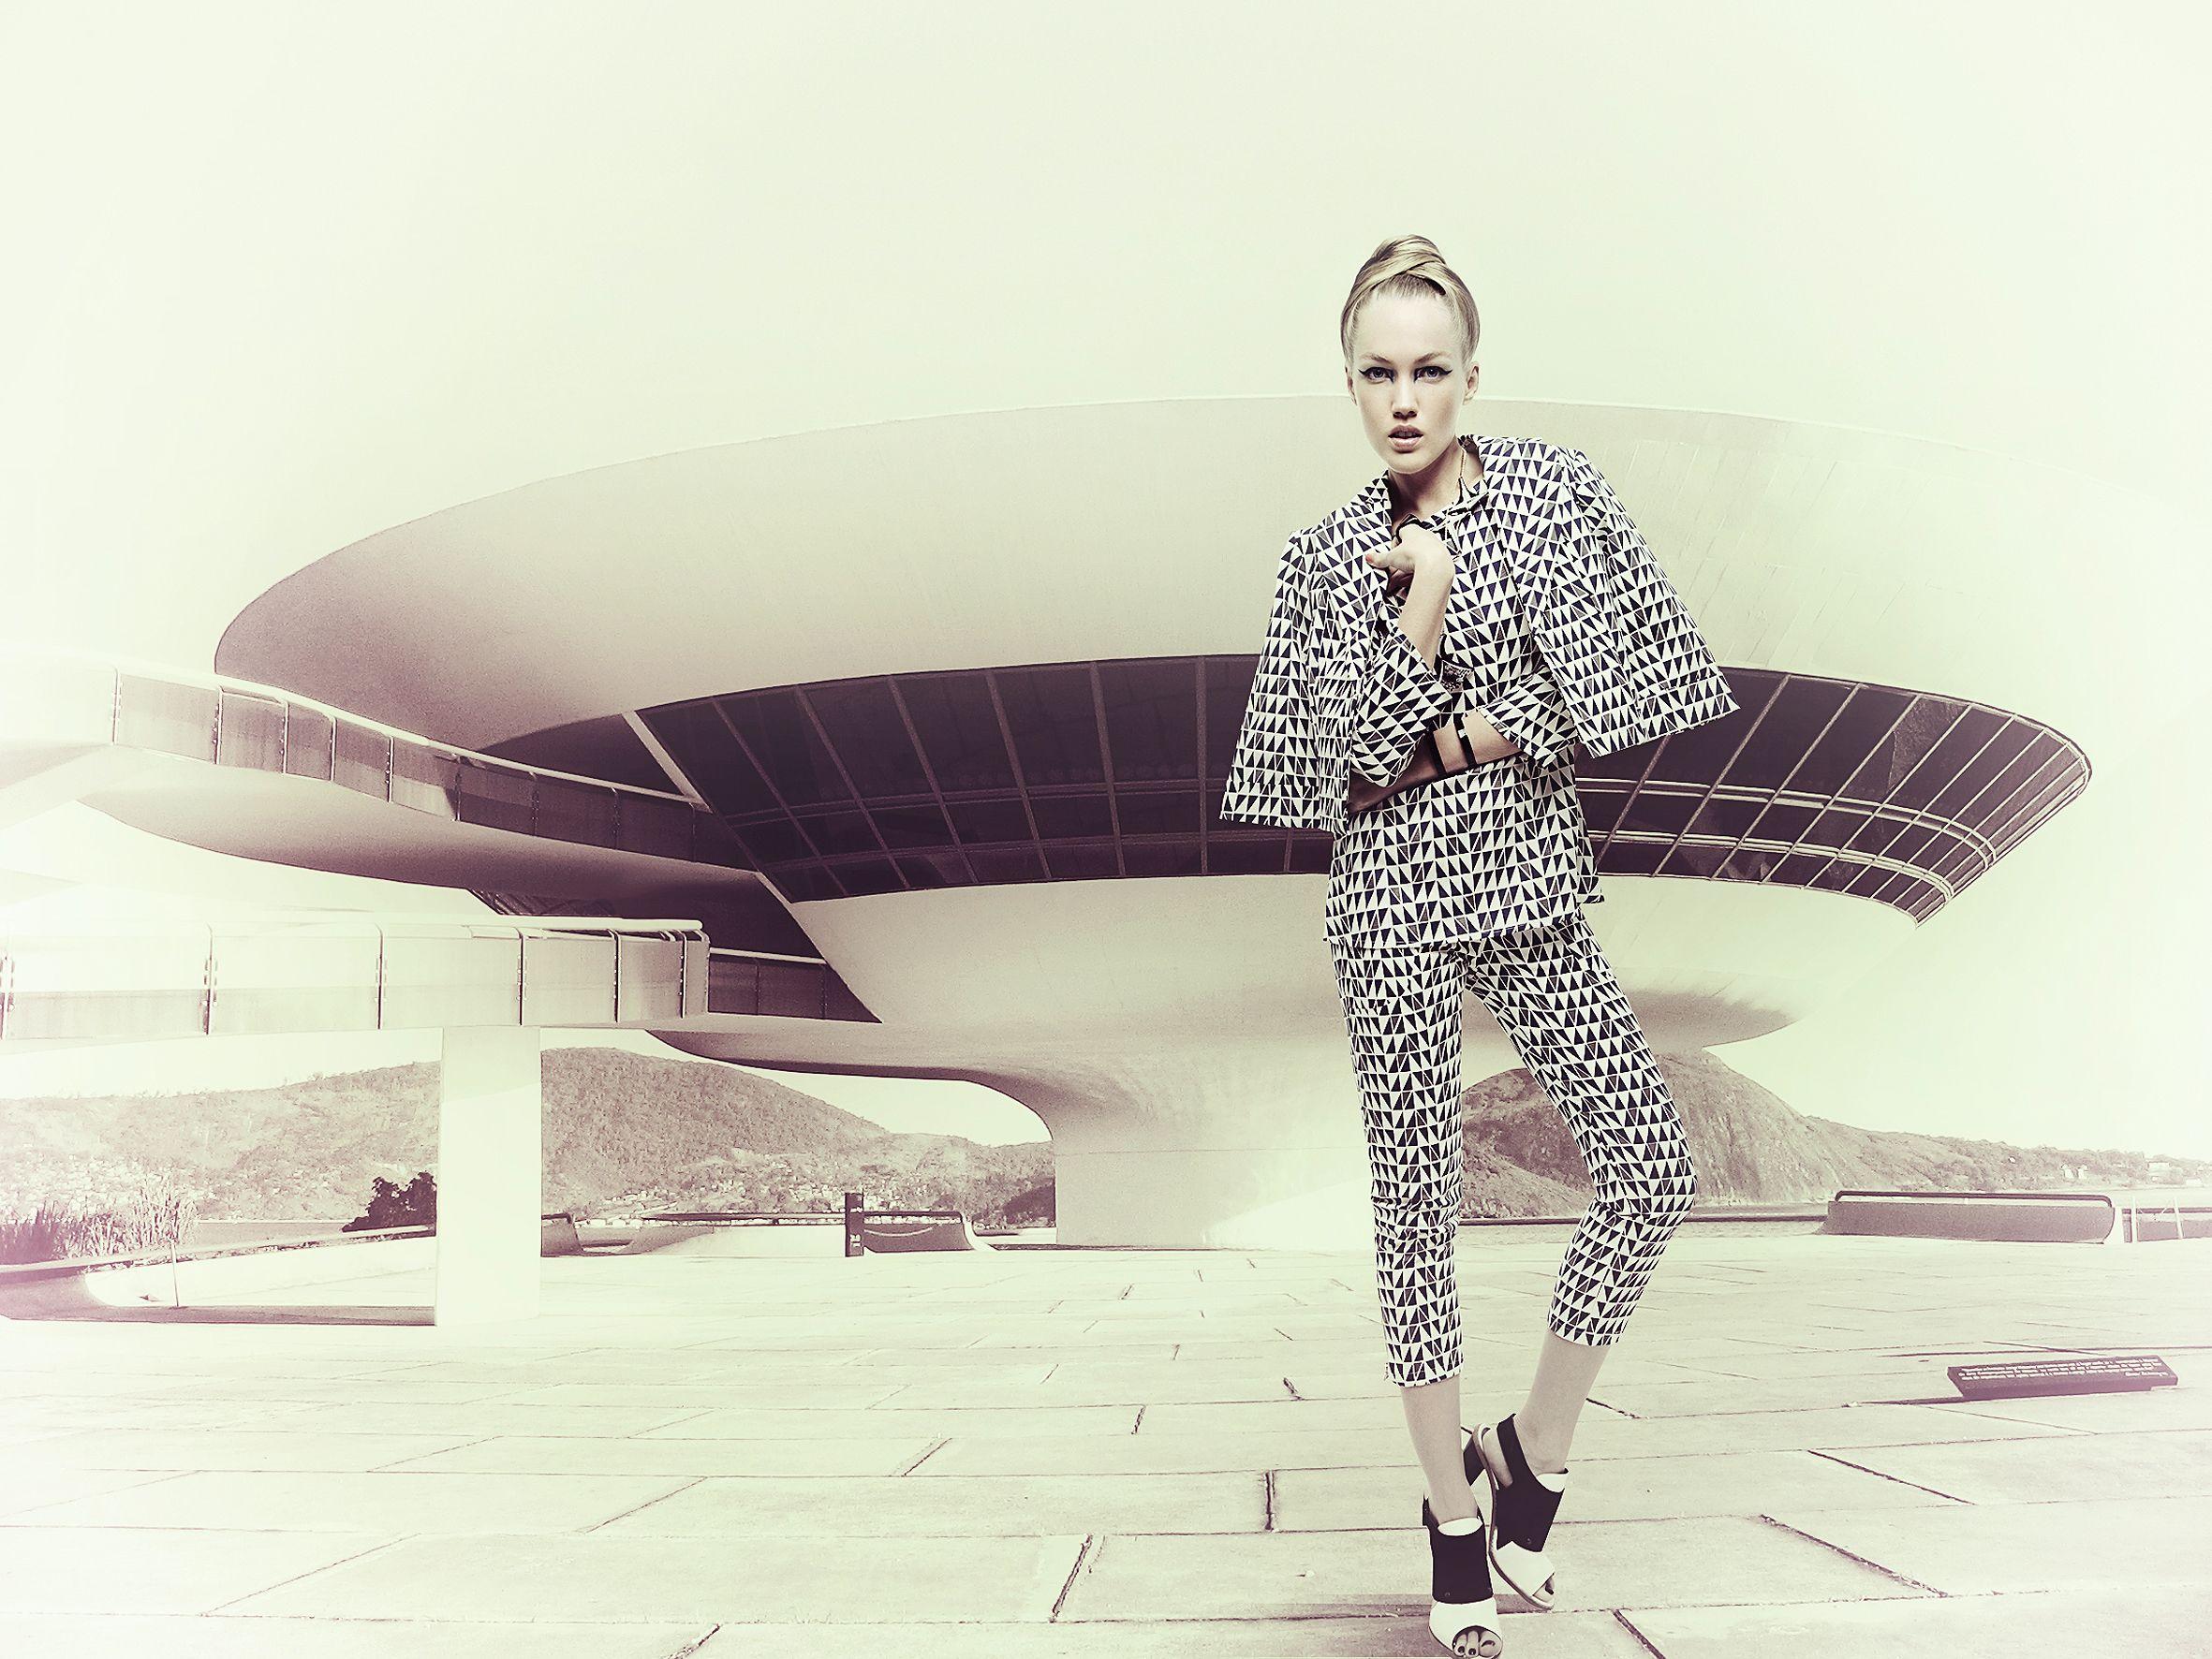 Jardin | Verão 2014 'Niemeyer'